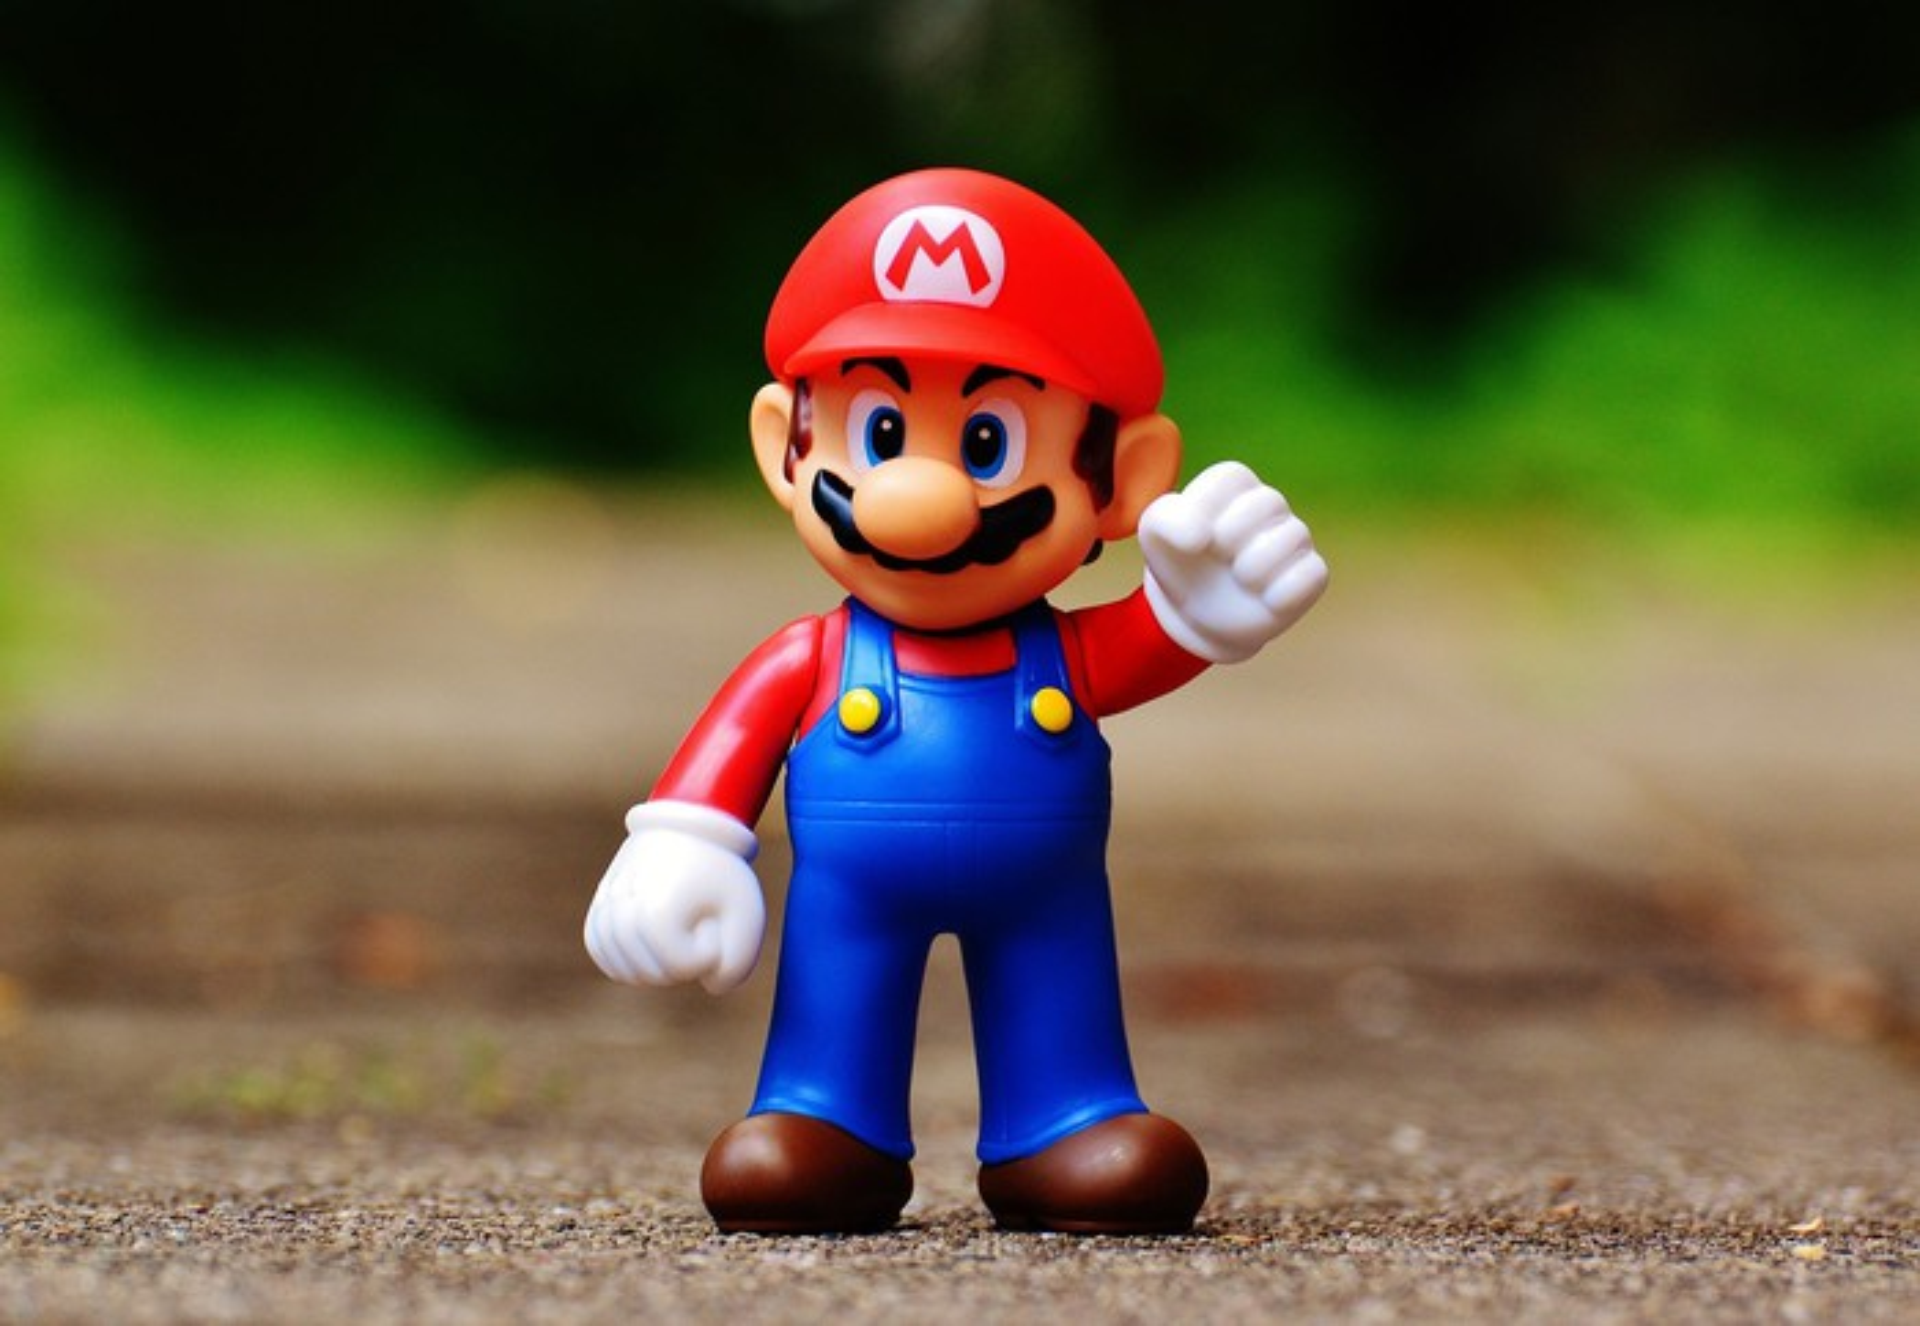 Toy figure of Nintendo's Mario character.